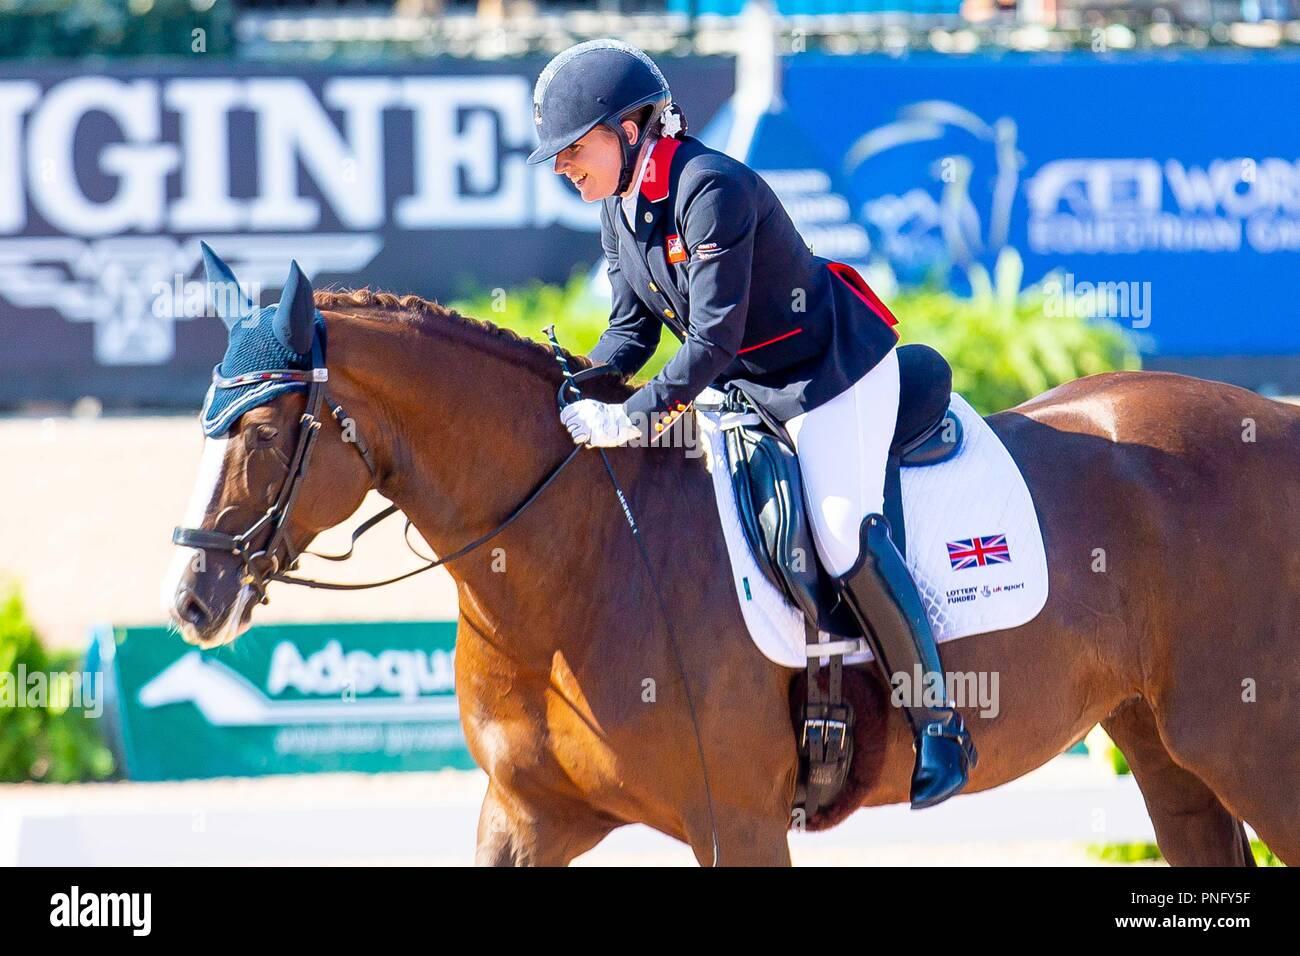 Winner. First Place. Natasha Baker riding Mount St John Diva Dannebrog. GBR. Team Test Grade lll.Para Dressage. Day 10. World Equestrian Games. WEG 2018 Tryon. North Carolina. USA. 21/09/2018. - Stock Image